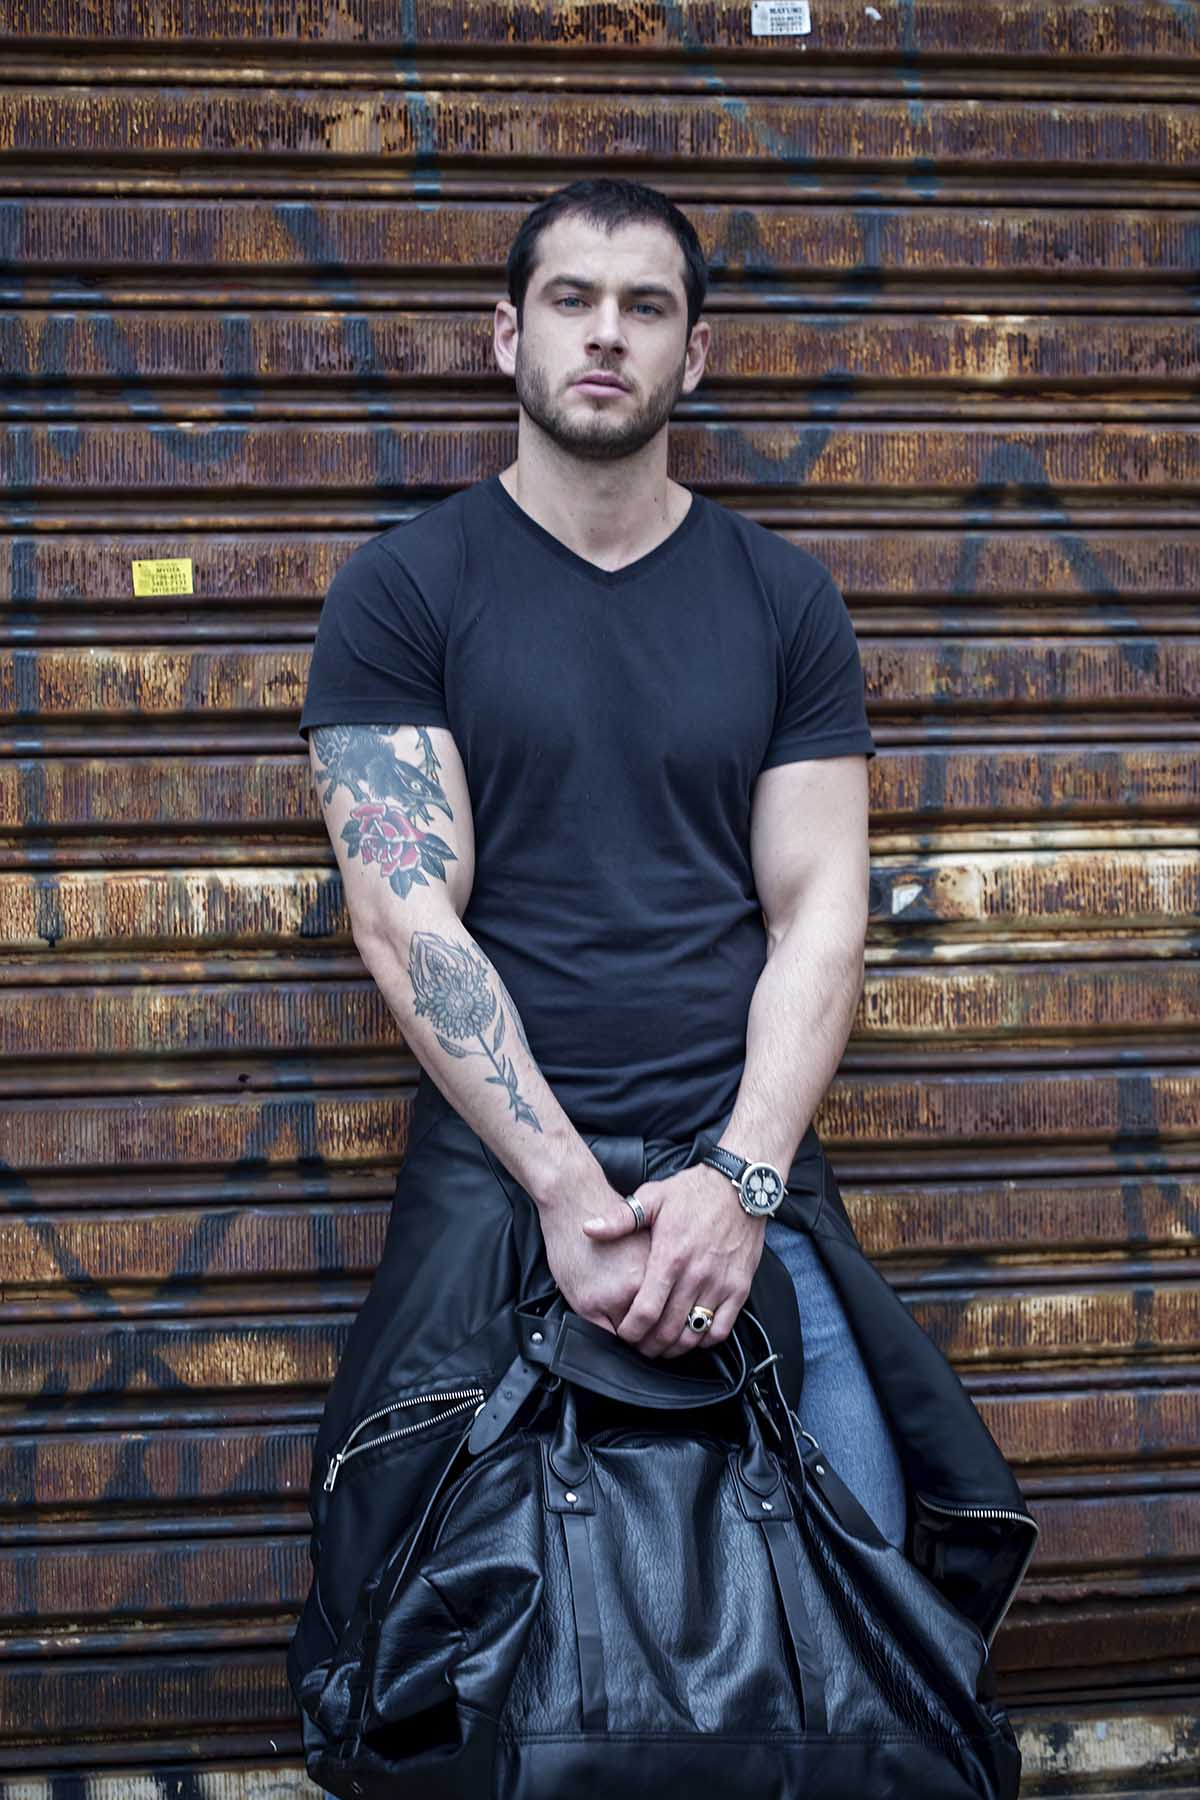 Davi Abedeno by Ronaldo Gutierrez for Brazilian Male Model